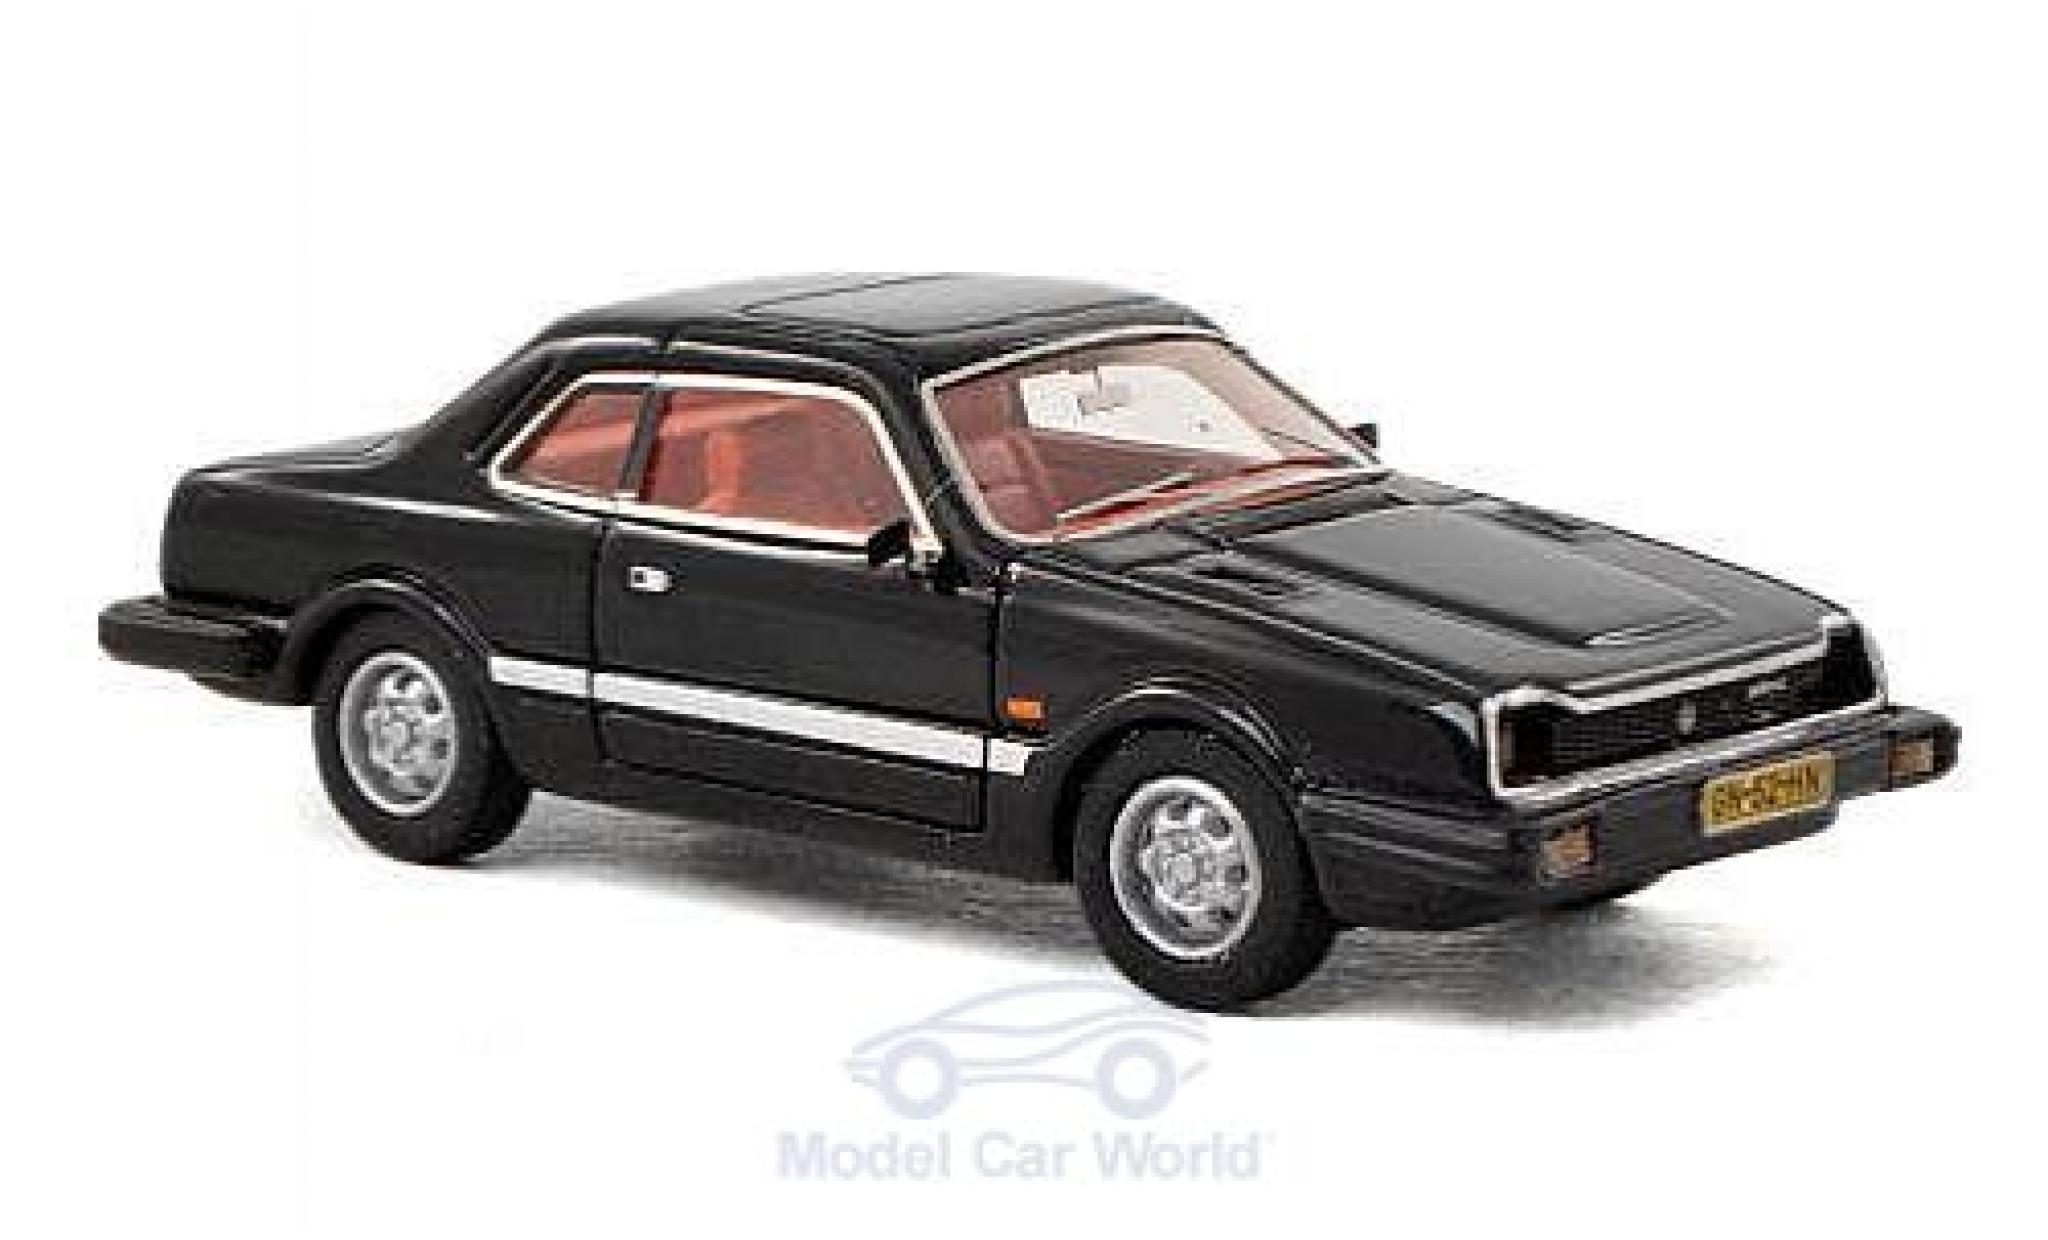 Diecast Honda Prelude 1/87 Neo MK1 Black 1981